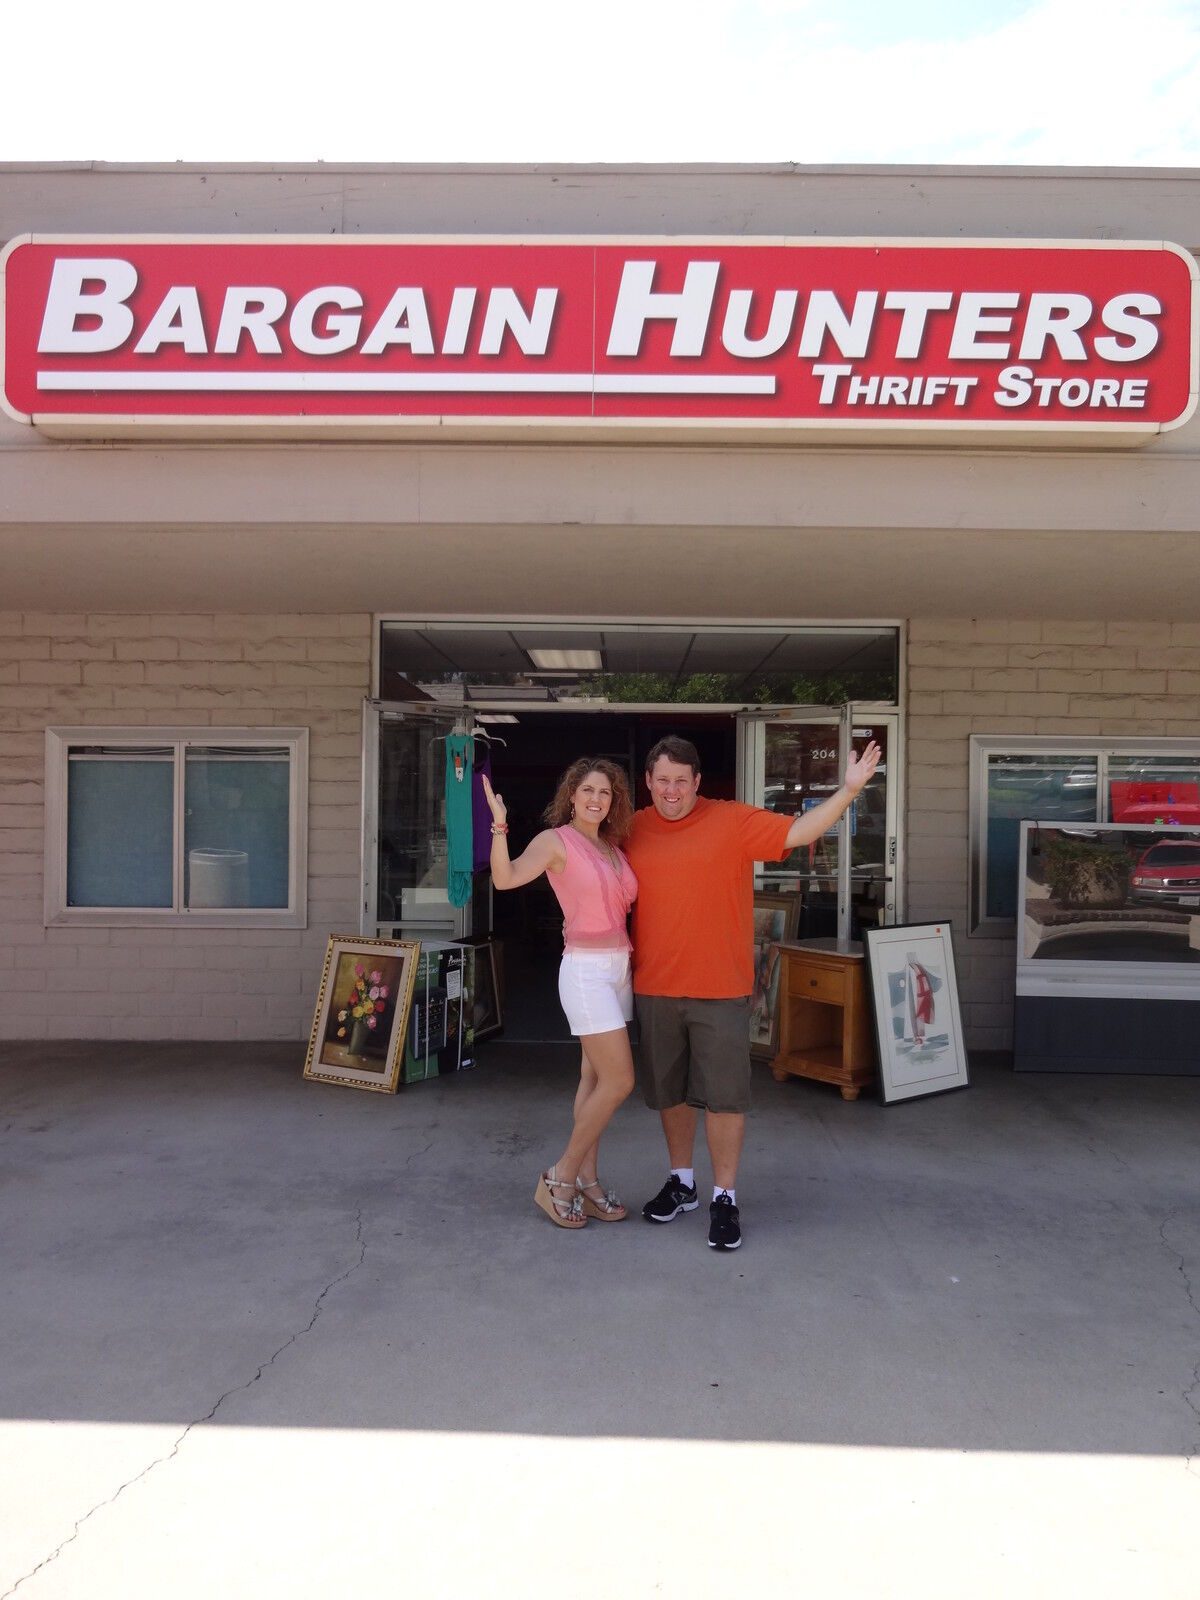 Bargain Hunters Thrift Store